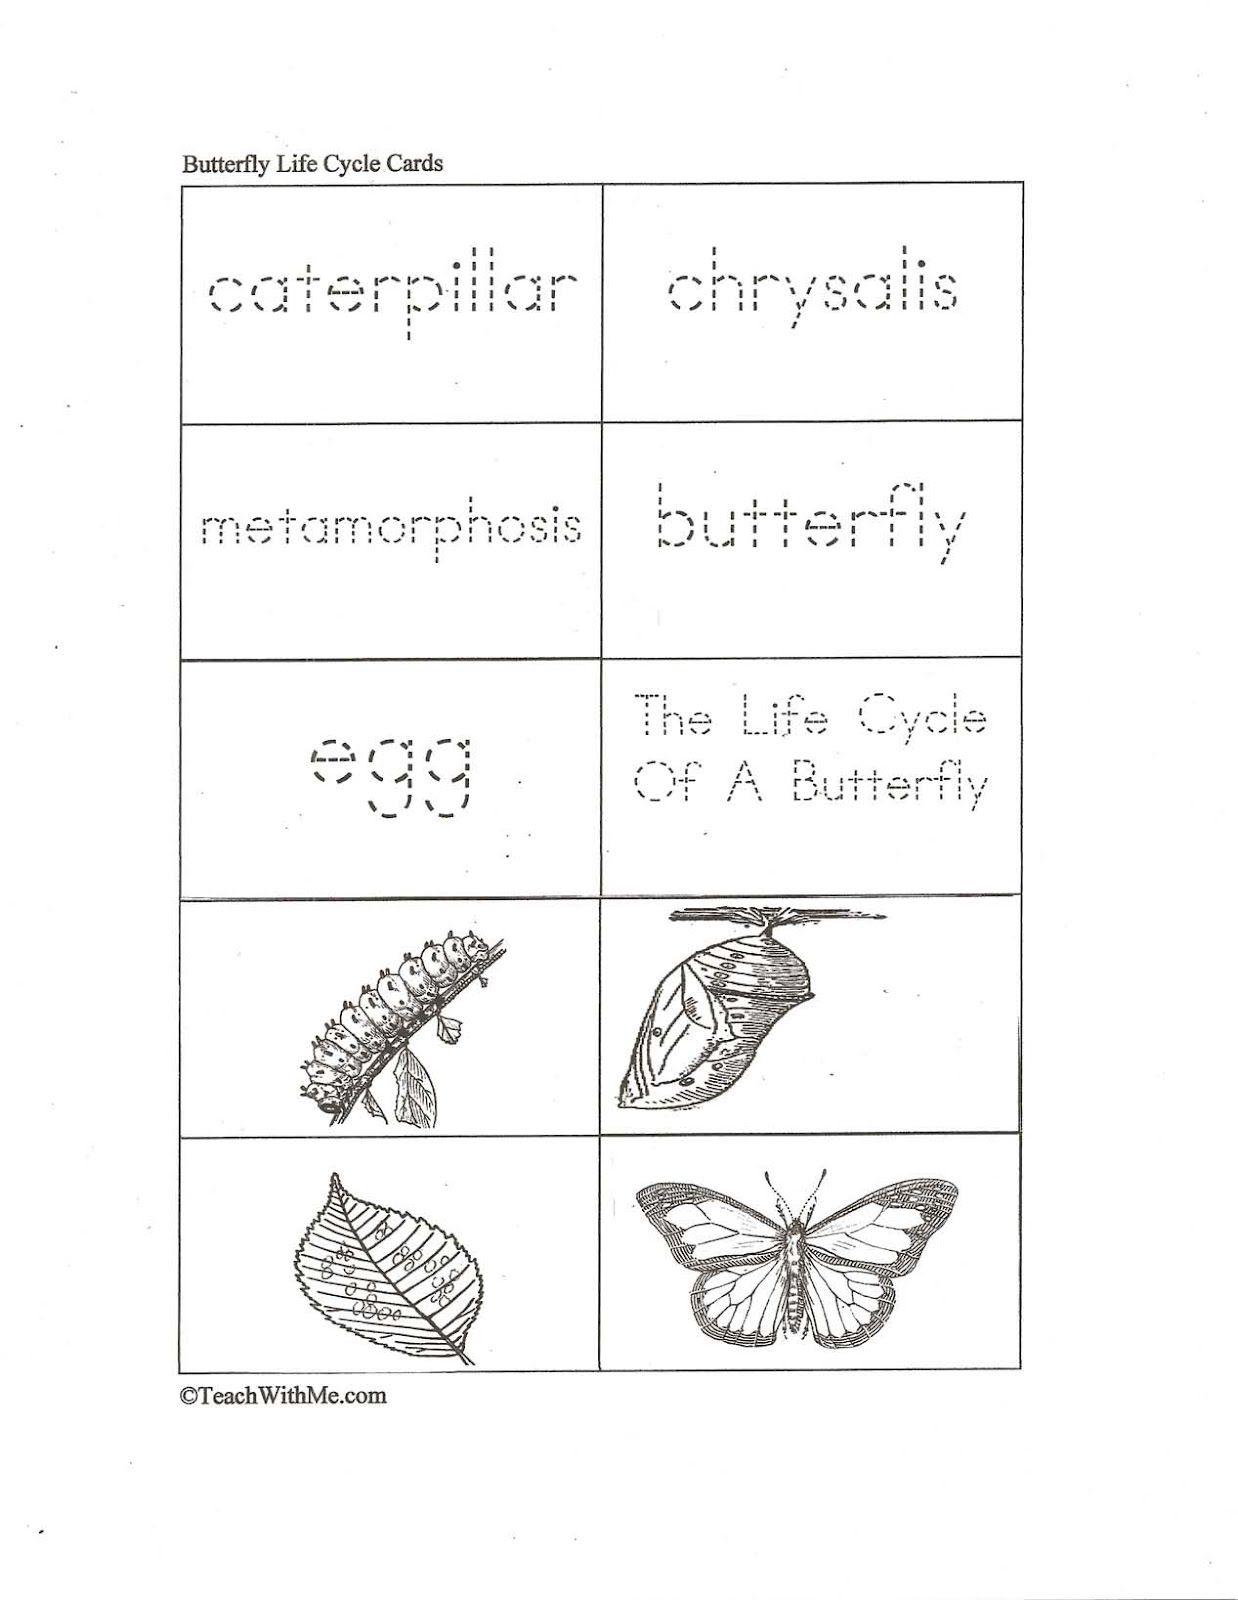 worksheet Life Cycle Of Butterfly Worksheet traceable butterfly life cycle cards cards